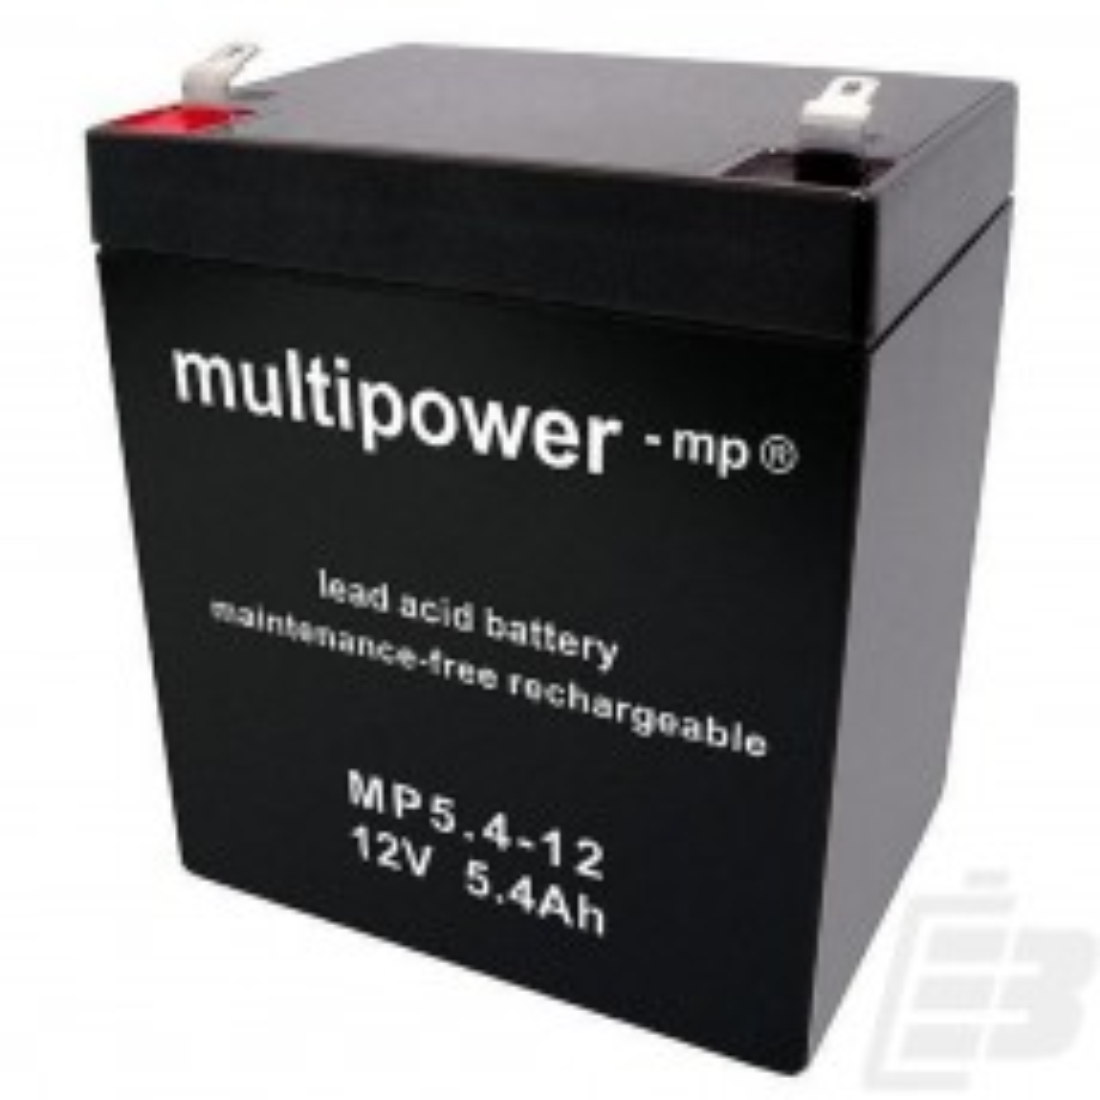 Multipower Lead Acid Battery 12V 5,4Ah